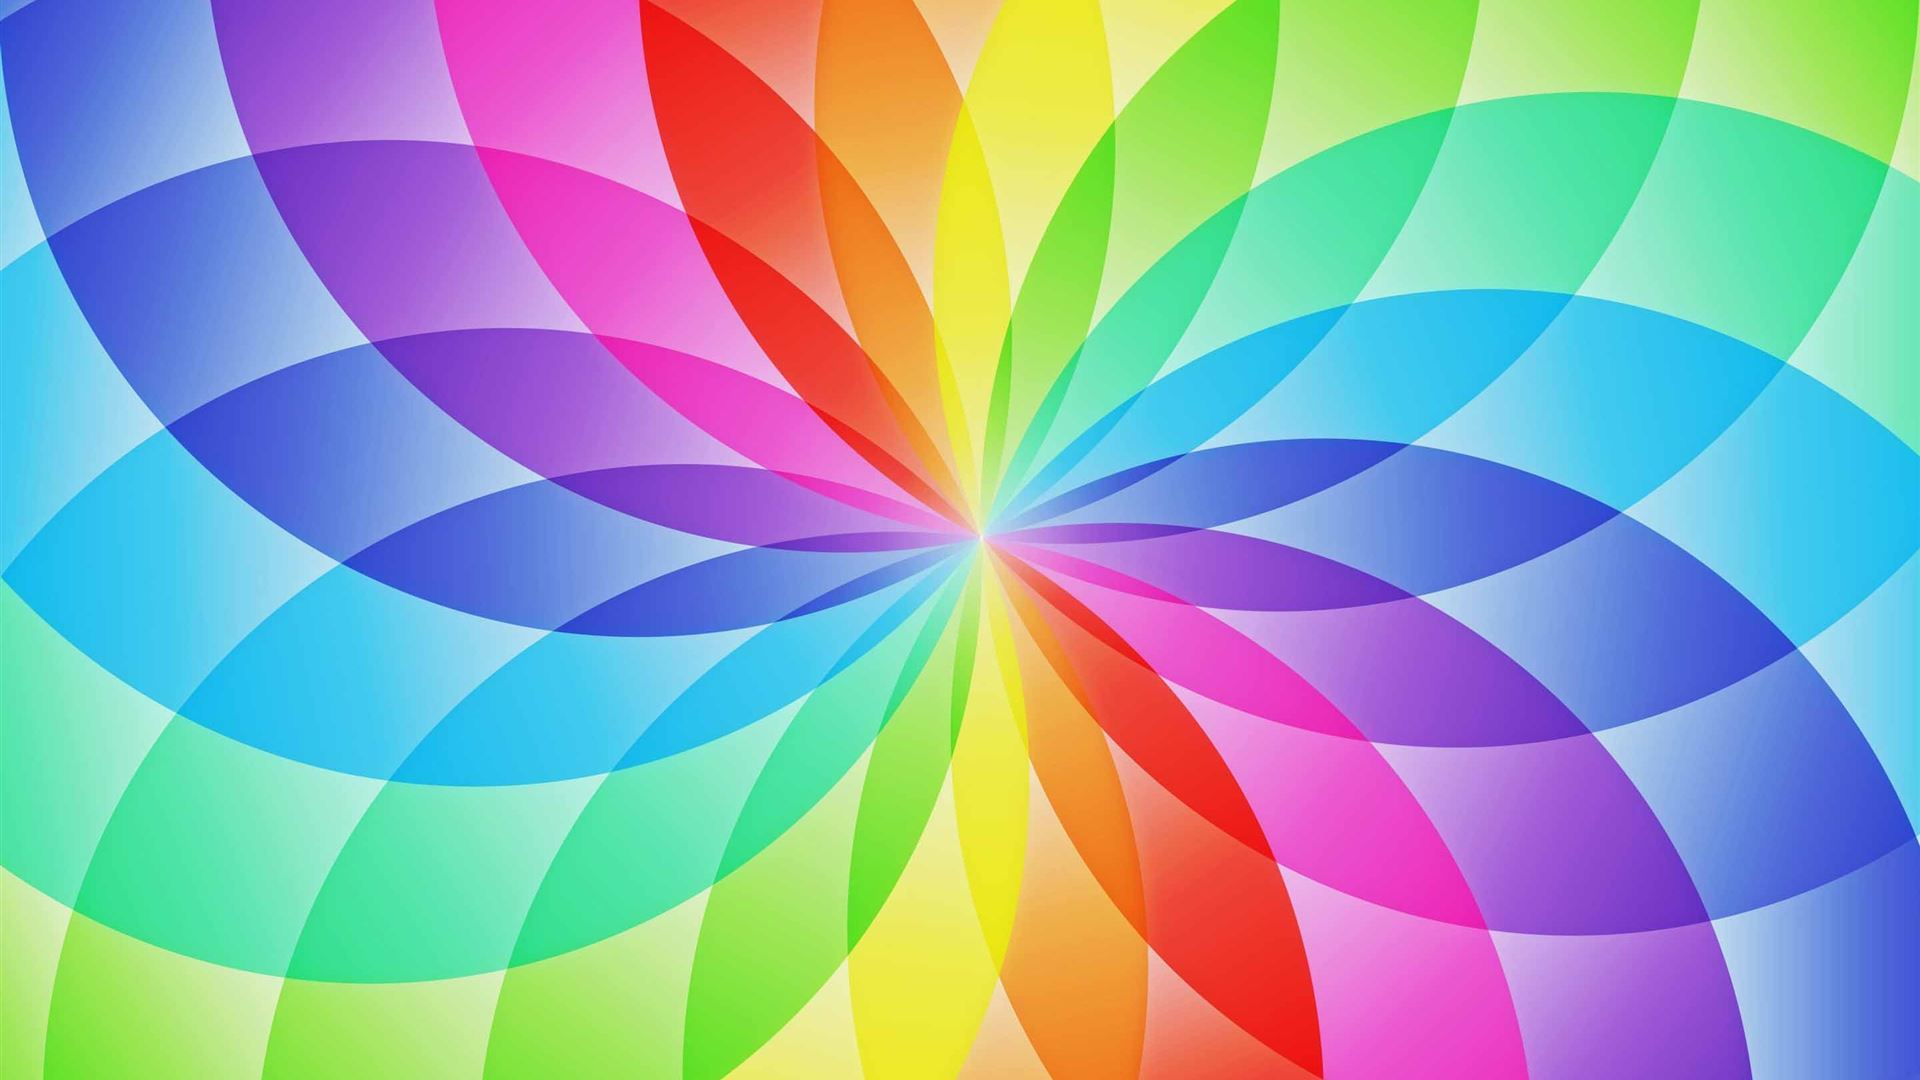 group of imac wallpaper hd rainbow